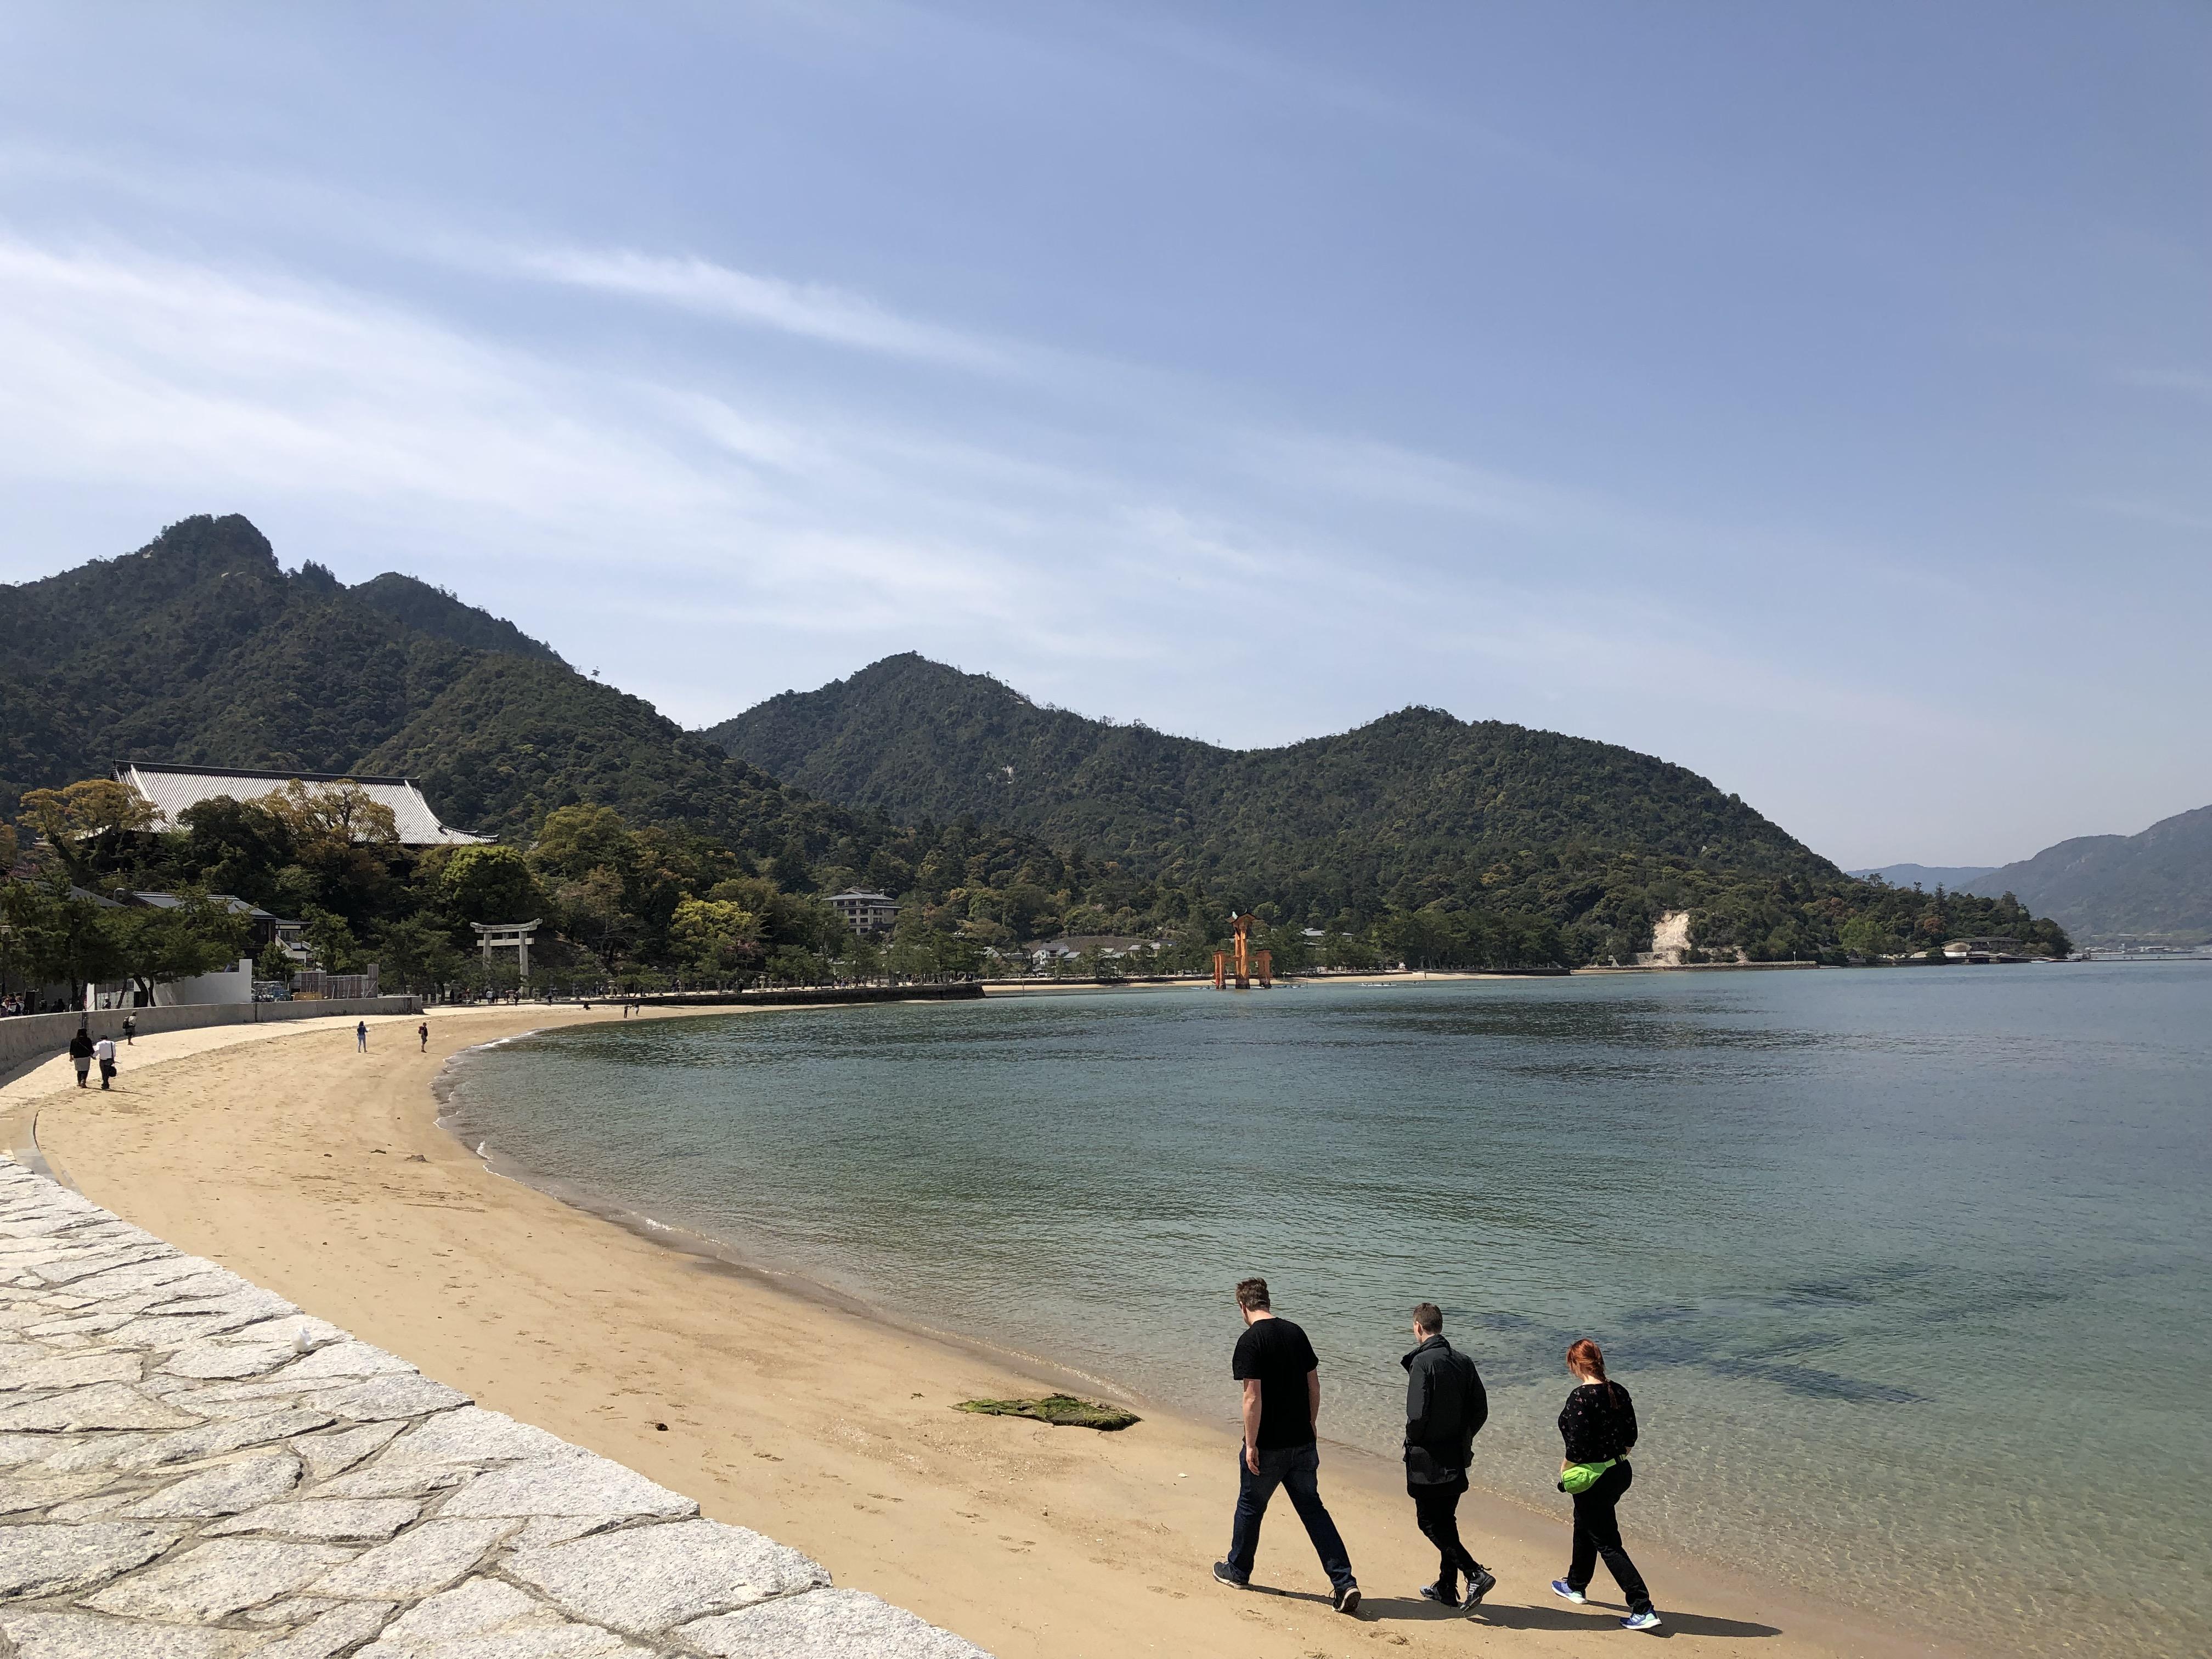 hiroshima beach